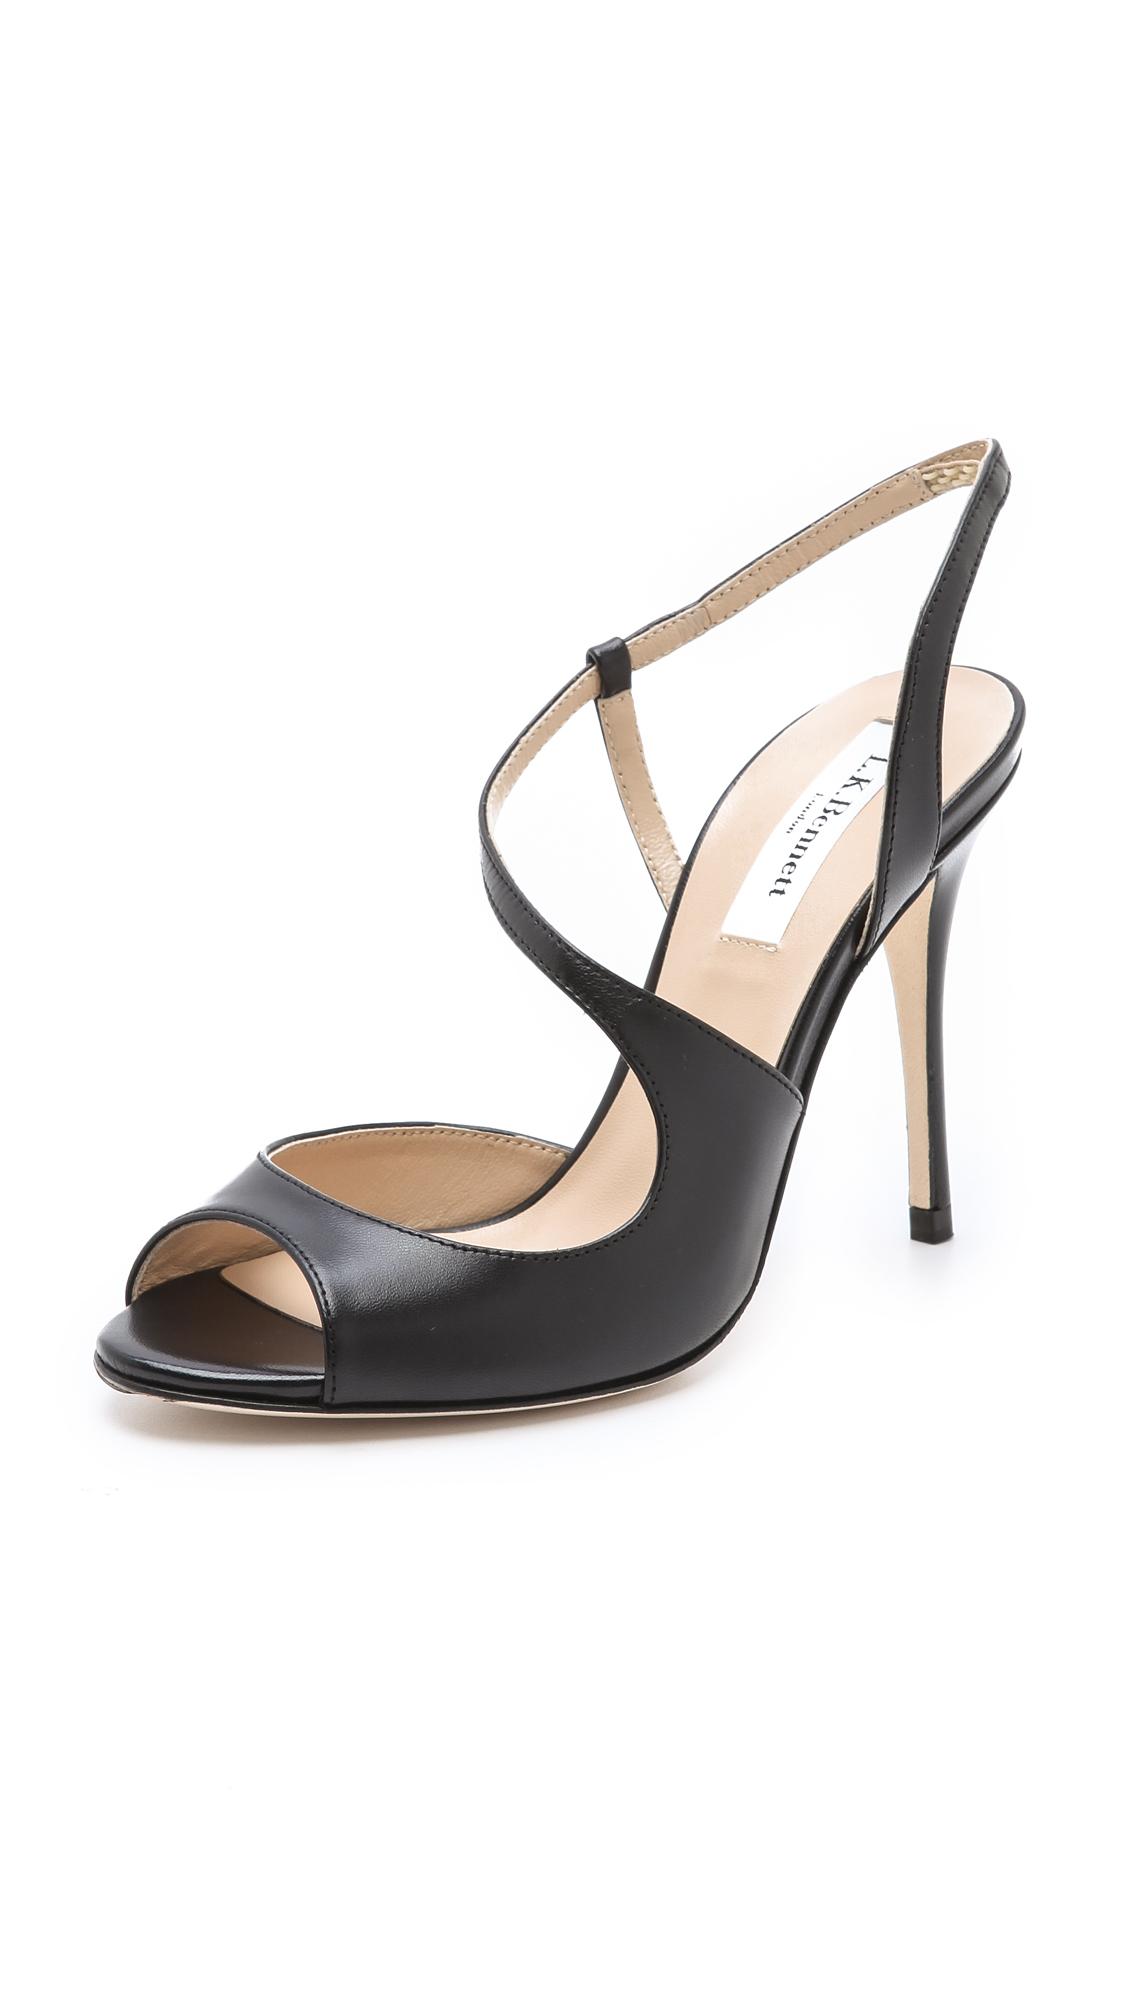 Lk Shoes Black